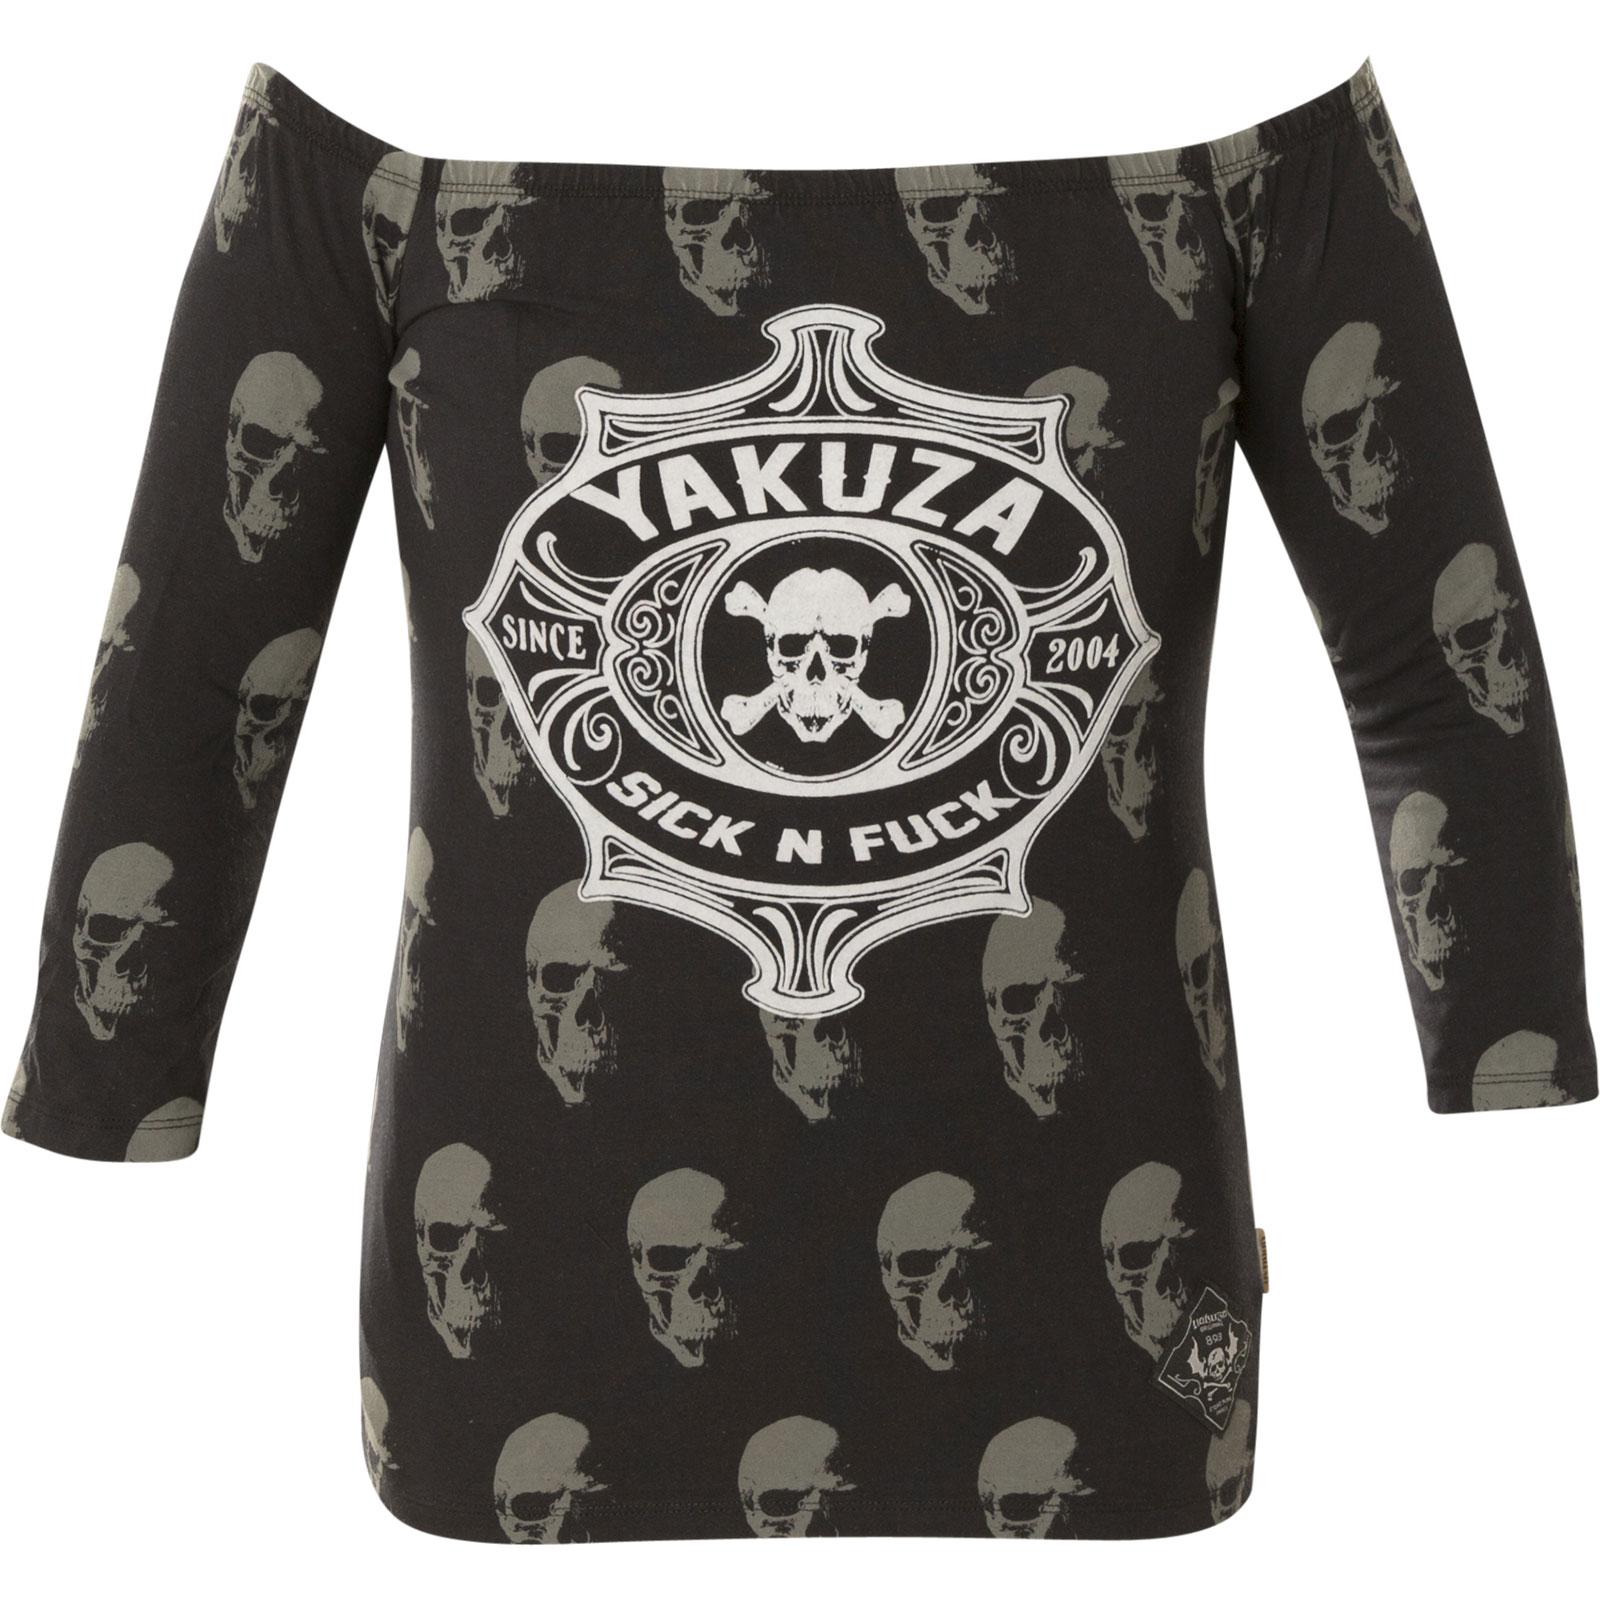 2fc427d97ffad7 ... Yakuza Damen Pullover Sick N Fuck Off Shoulder Longsleeve GLSB-11136  Black Schwarz ...